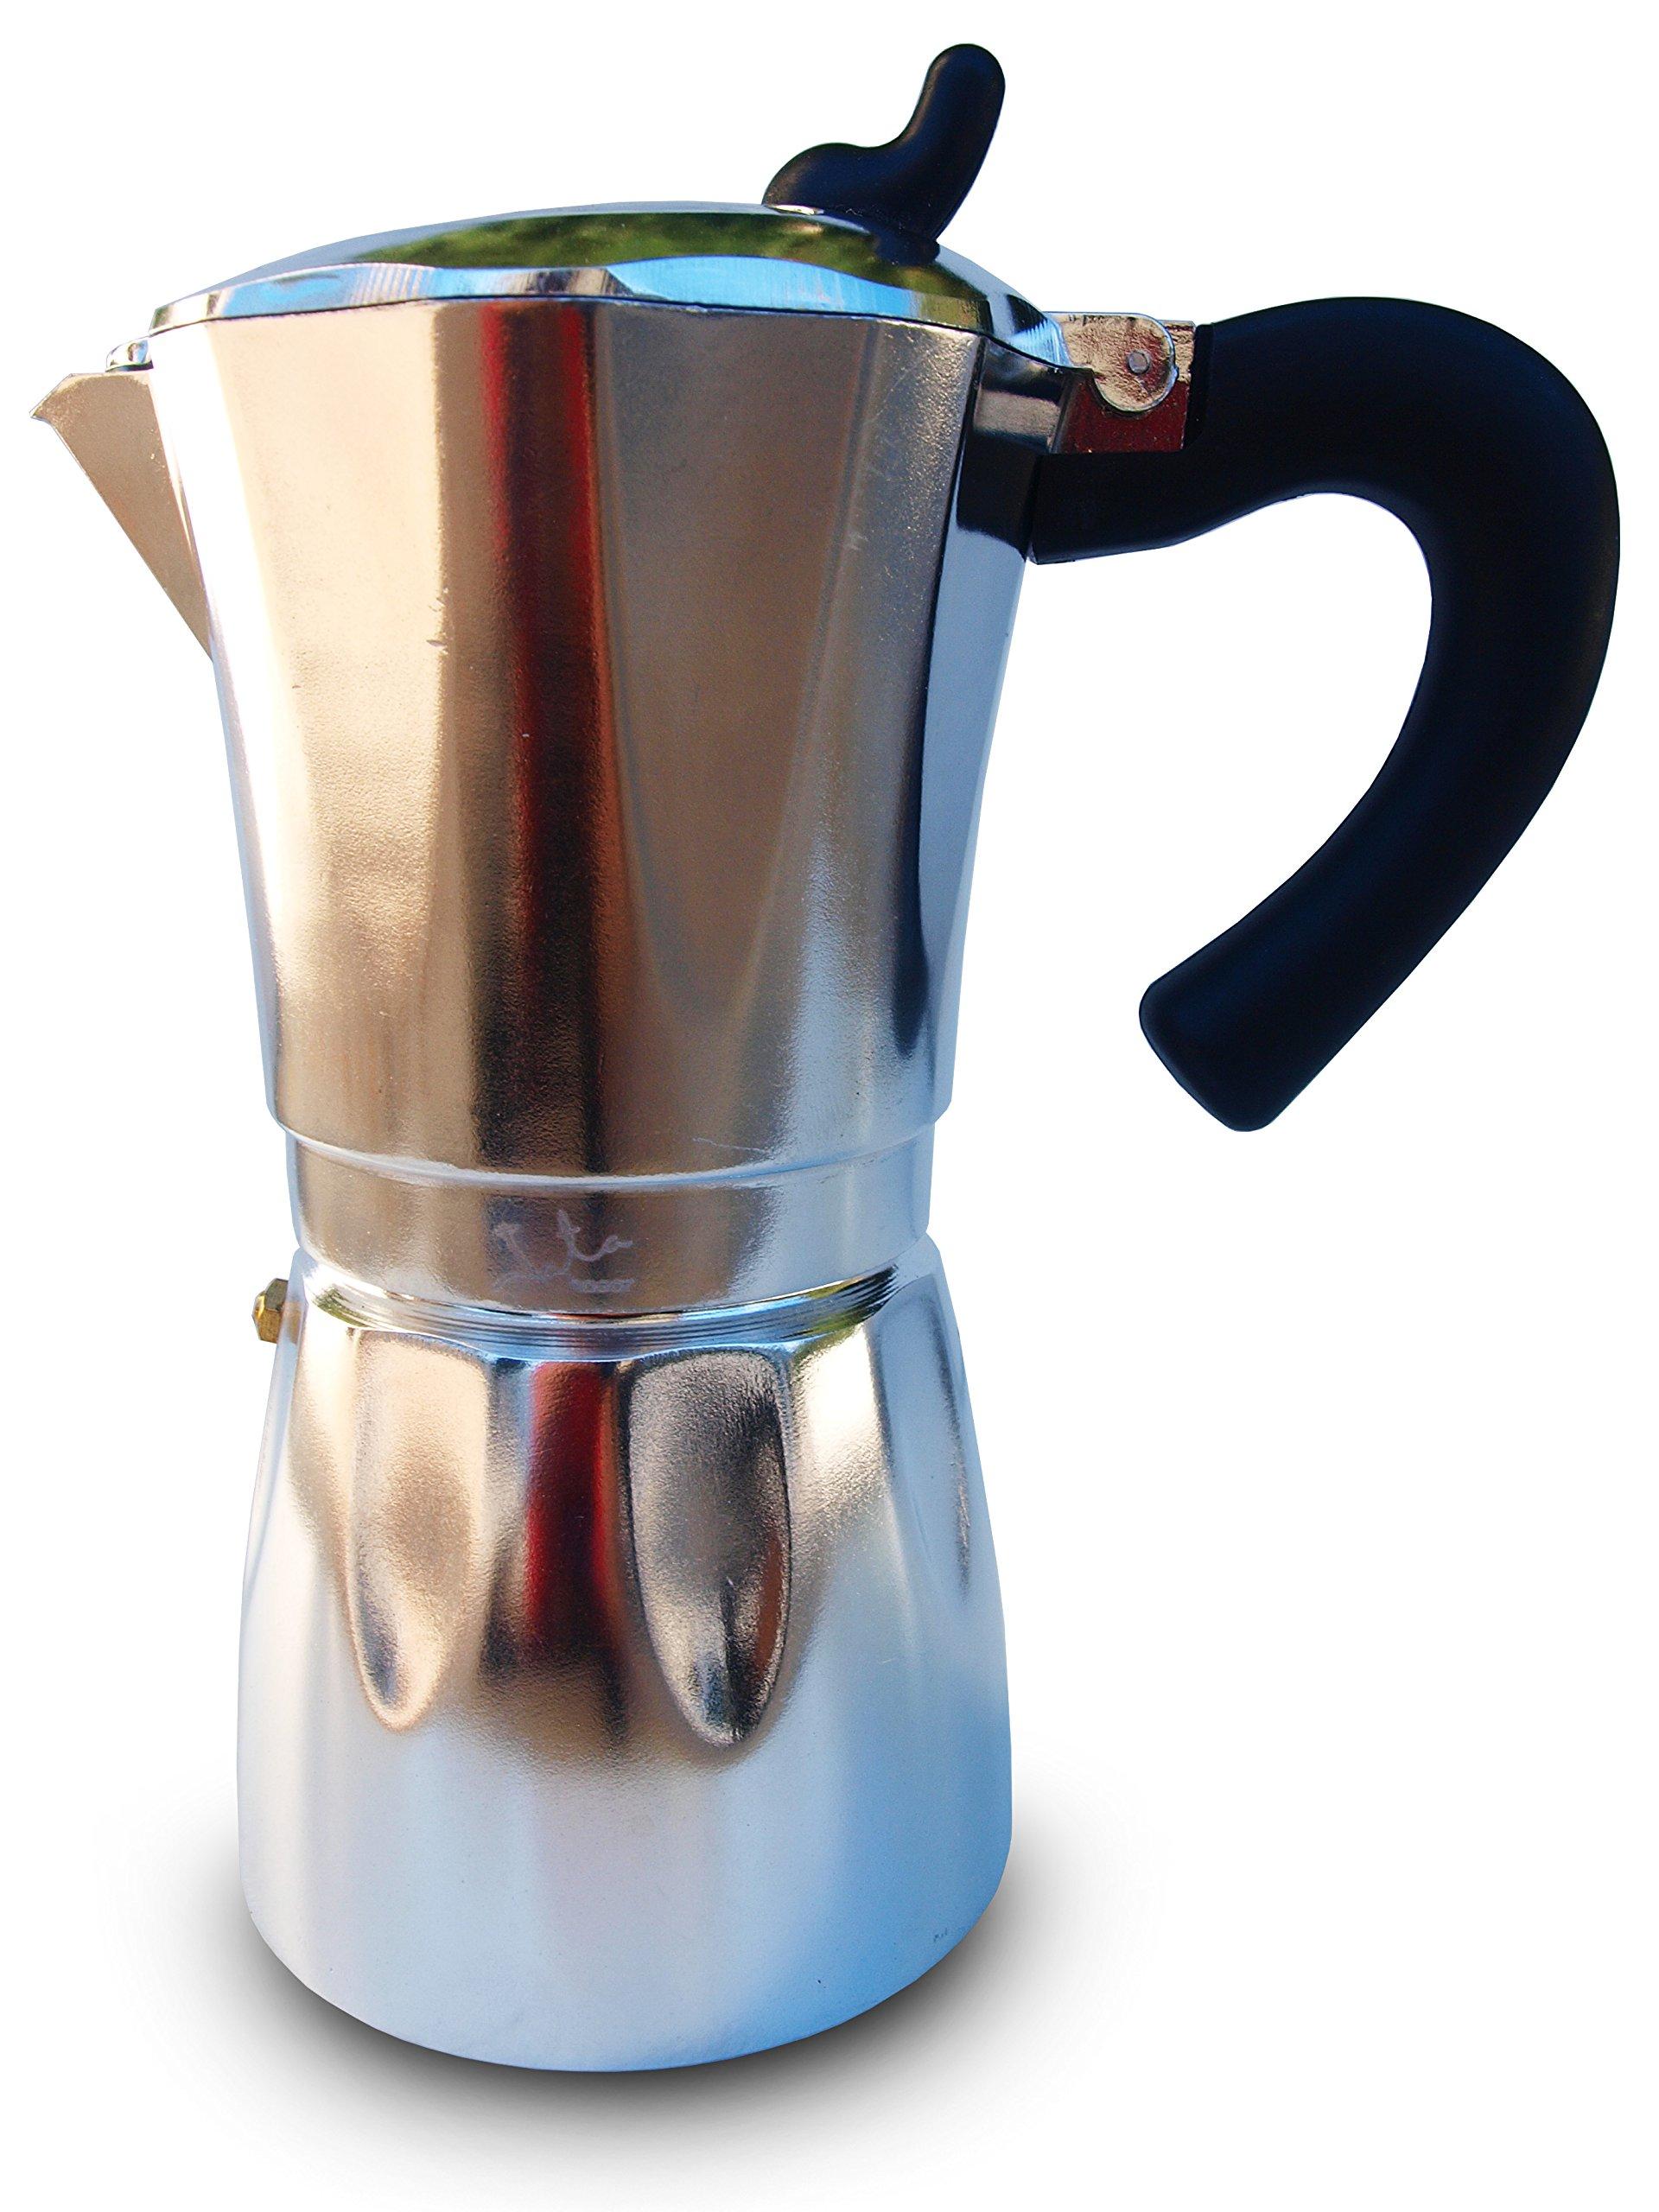 Jata Cafetera Italiana 9 Tazas: Amazon.es: Hogar